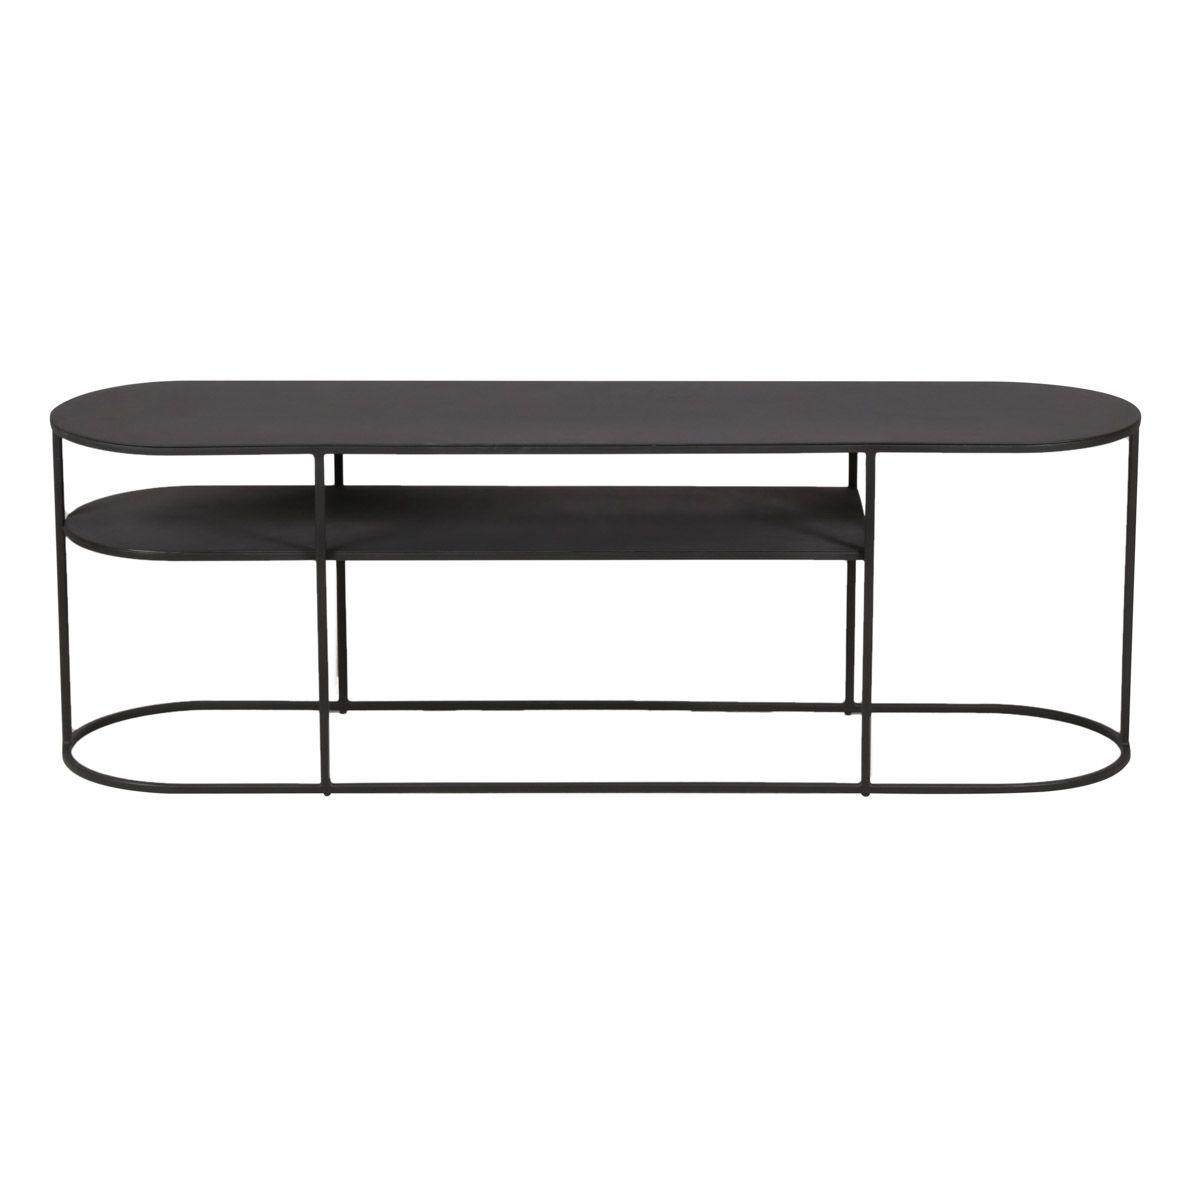 Table basse en métal noir ovale 120 cm